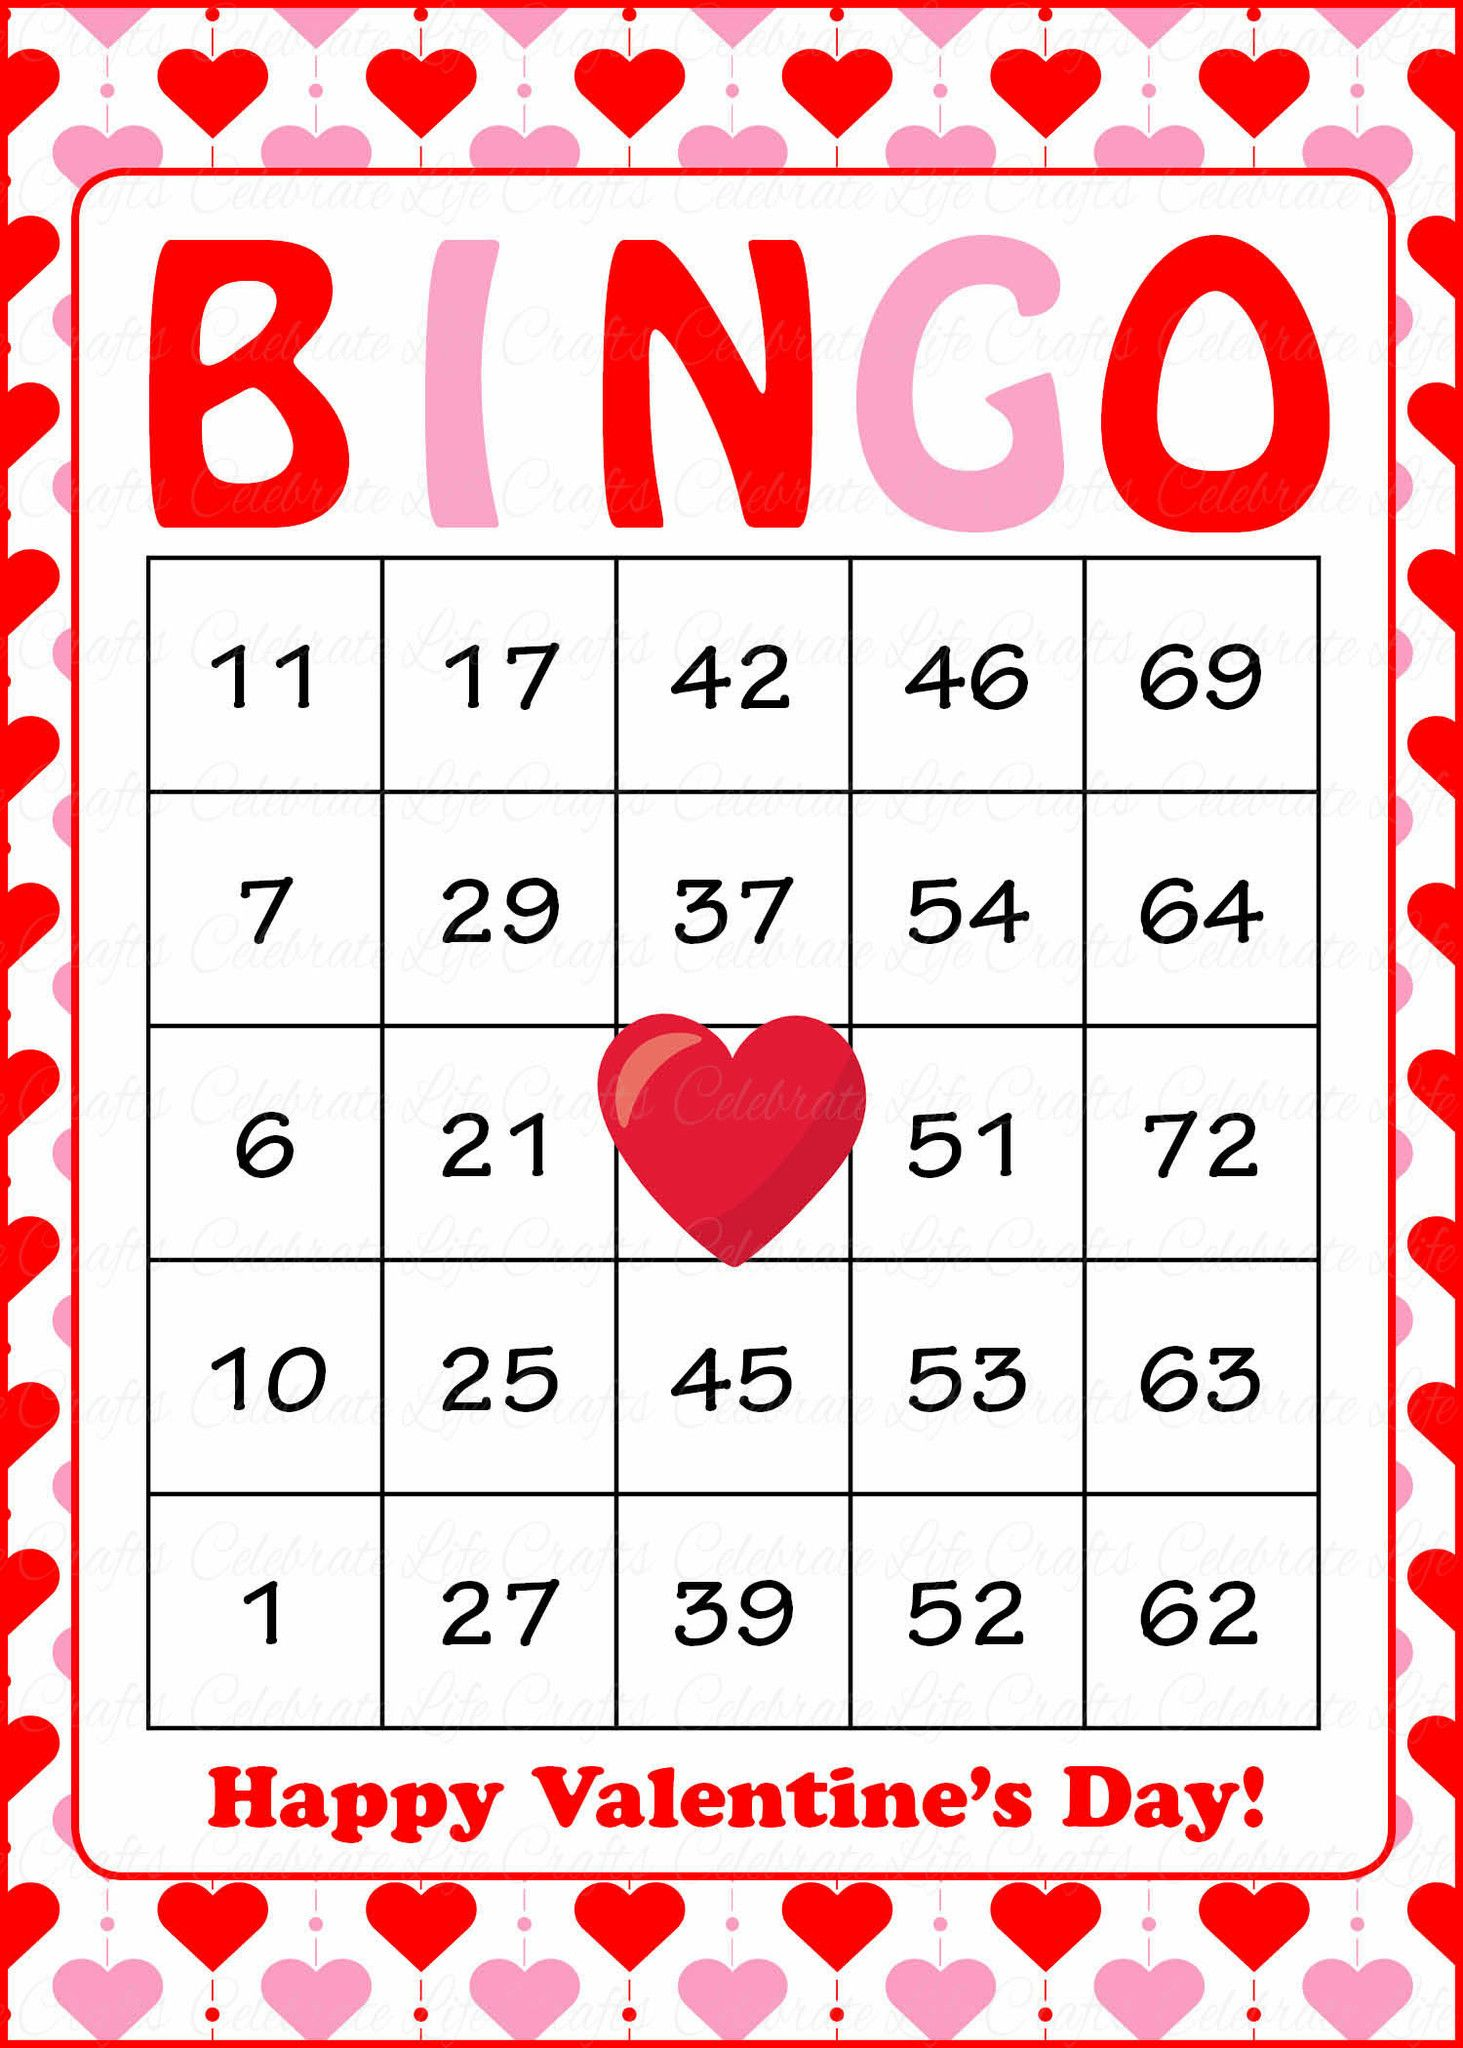 valentines bingo cards printable download prefilled valentines party games red pink hearts v1005 - Valentine Bingo Cards